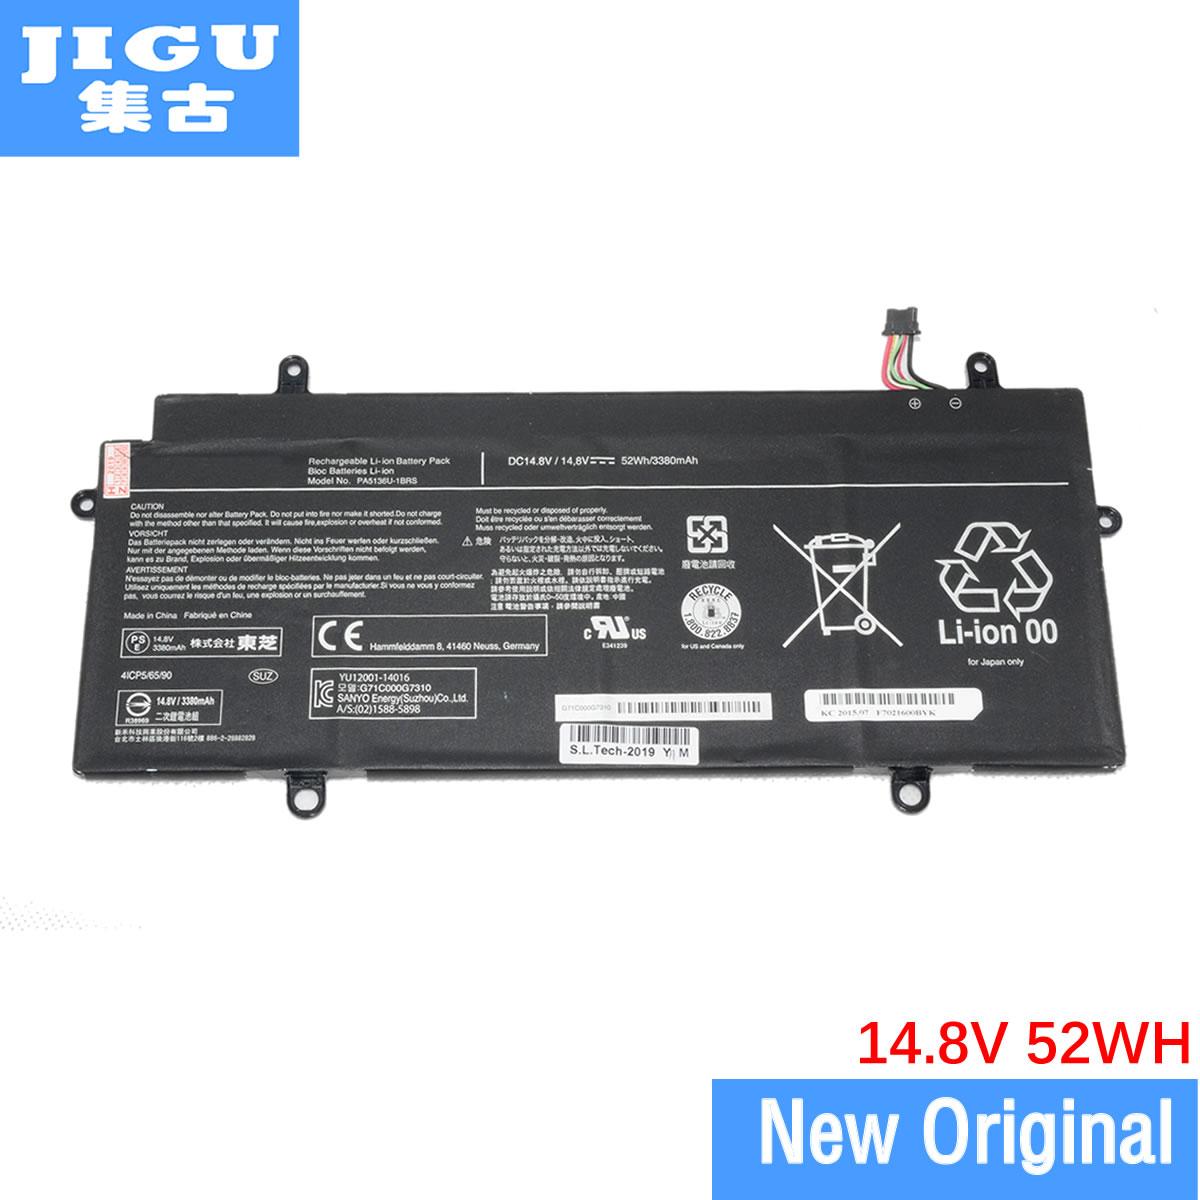 JIGU PA5136U-1BRS Original Laptop Battery For Toshiba For Portege Z30-C Z30 Z30-AK03S Z30-AK04S 15.2V 52WH